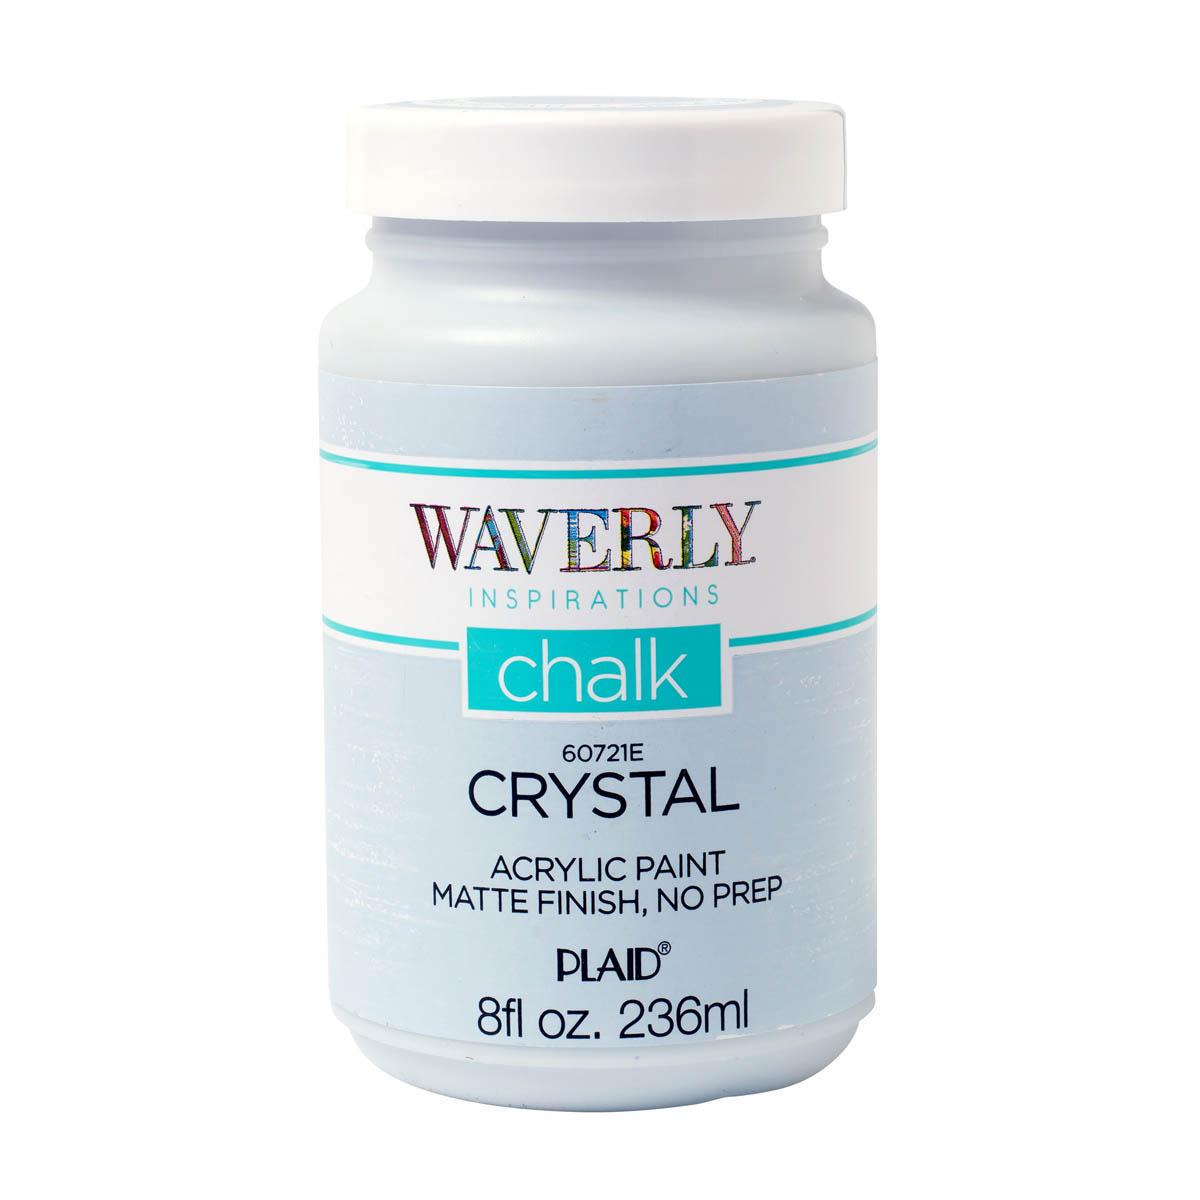 Waverly ® Inspirations Chalk Acrylic Paint - Crystal, 8 oz.